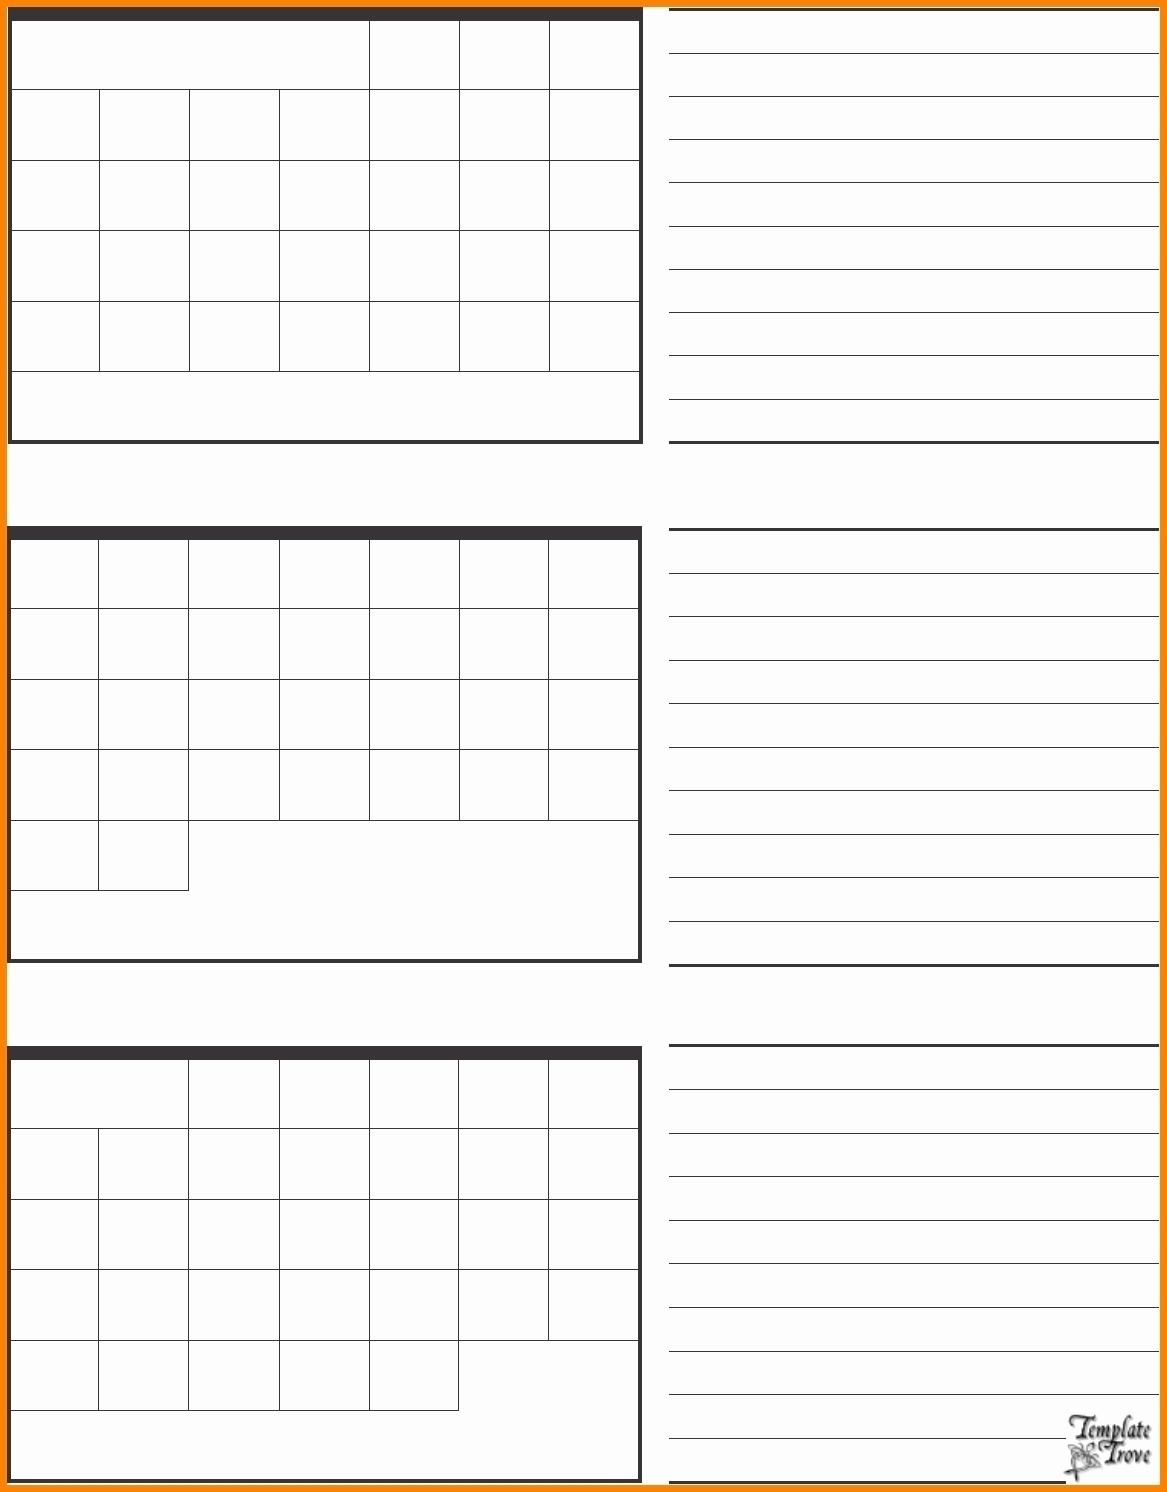 Free Printable 3 Month Calendar Template | Template Calendar Printable within Free Printable 3 Month Calendar Template